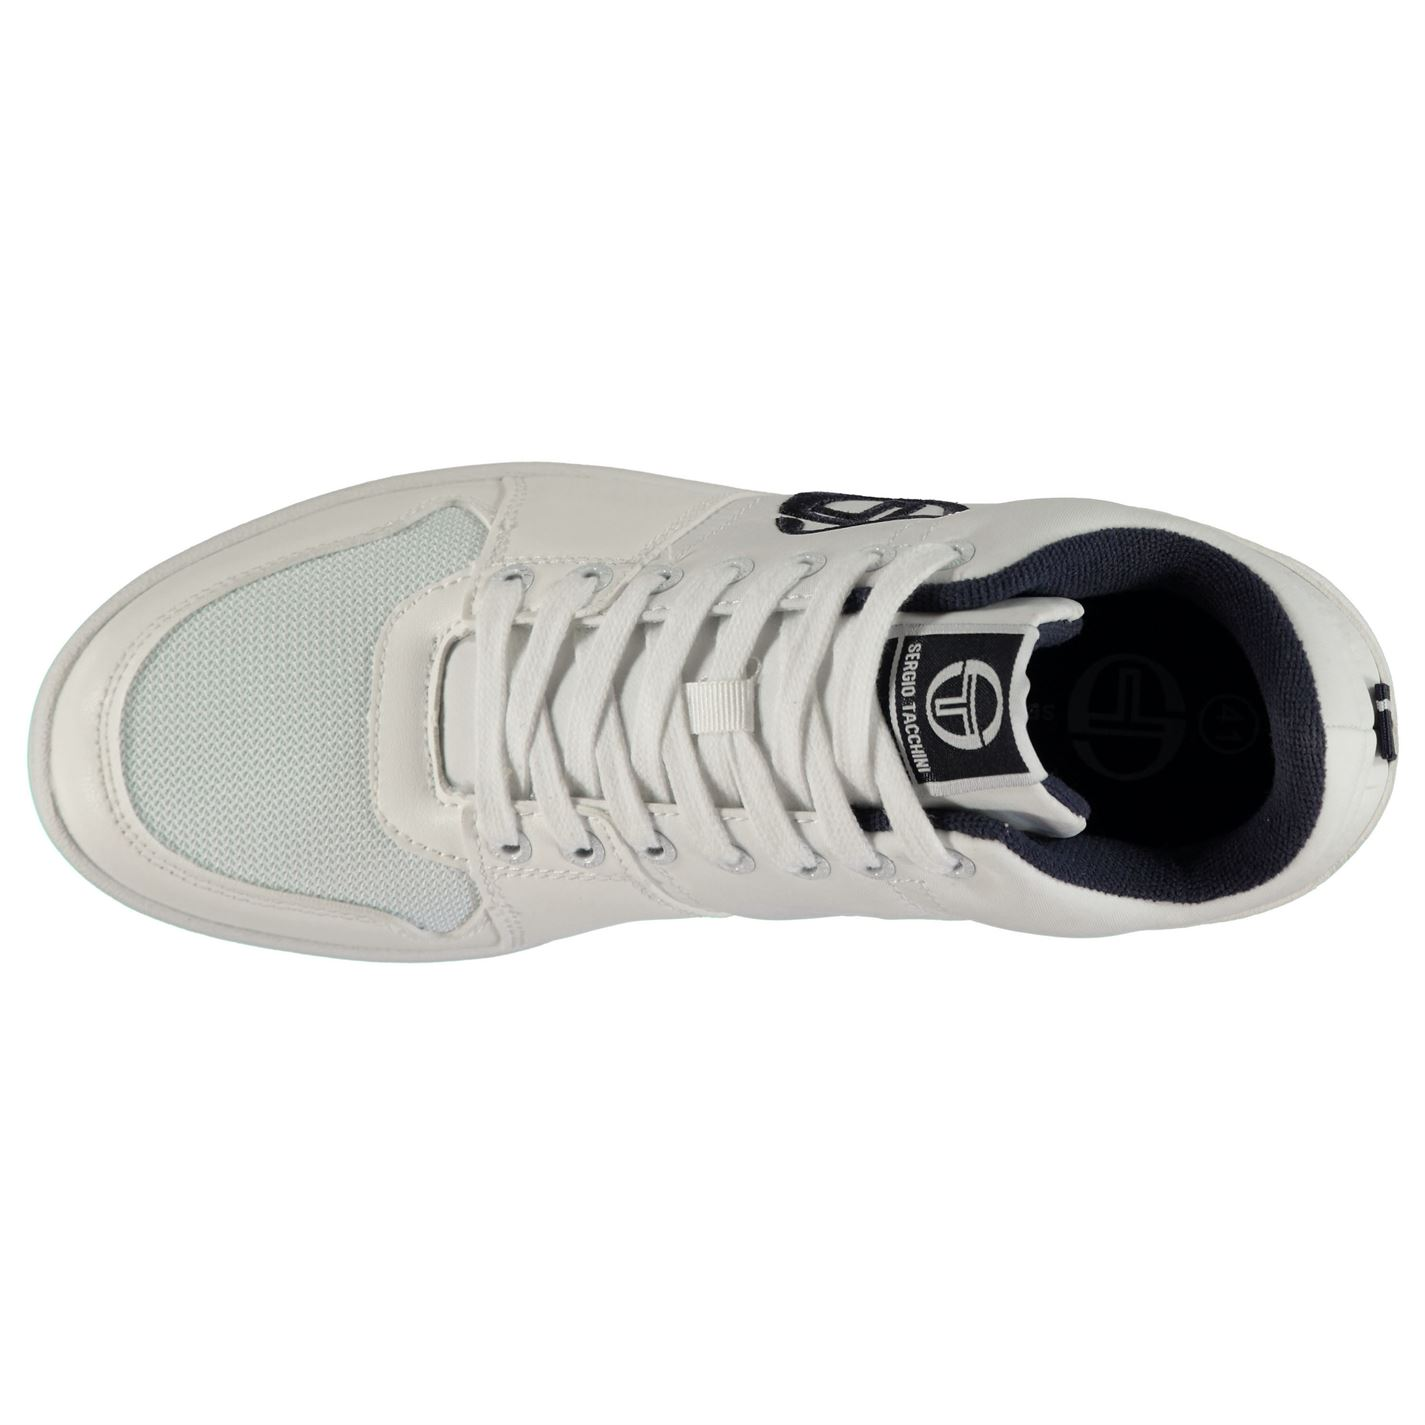 Sergio Tacchini Olimpia Mix Sneakers Mens Gents Classic